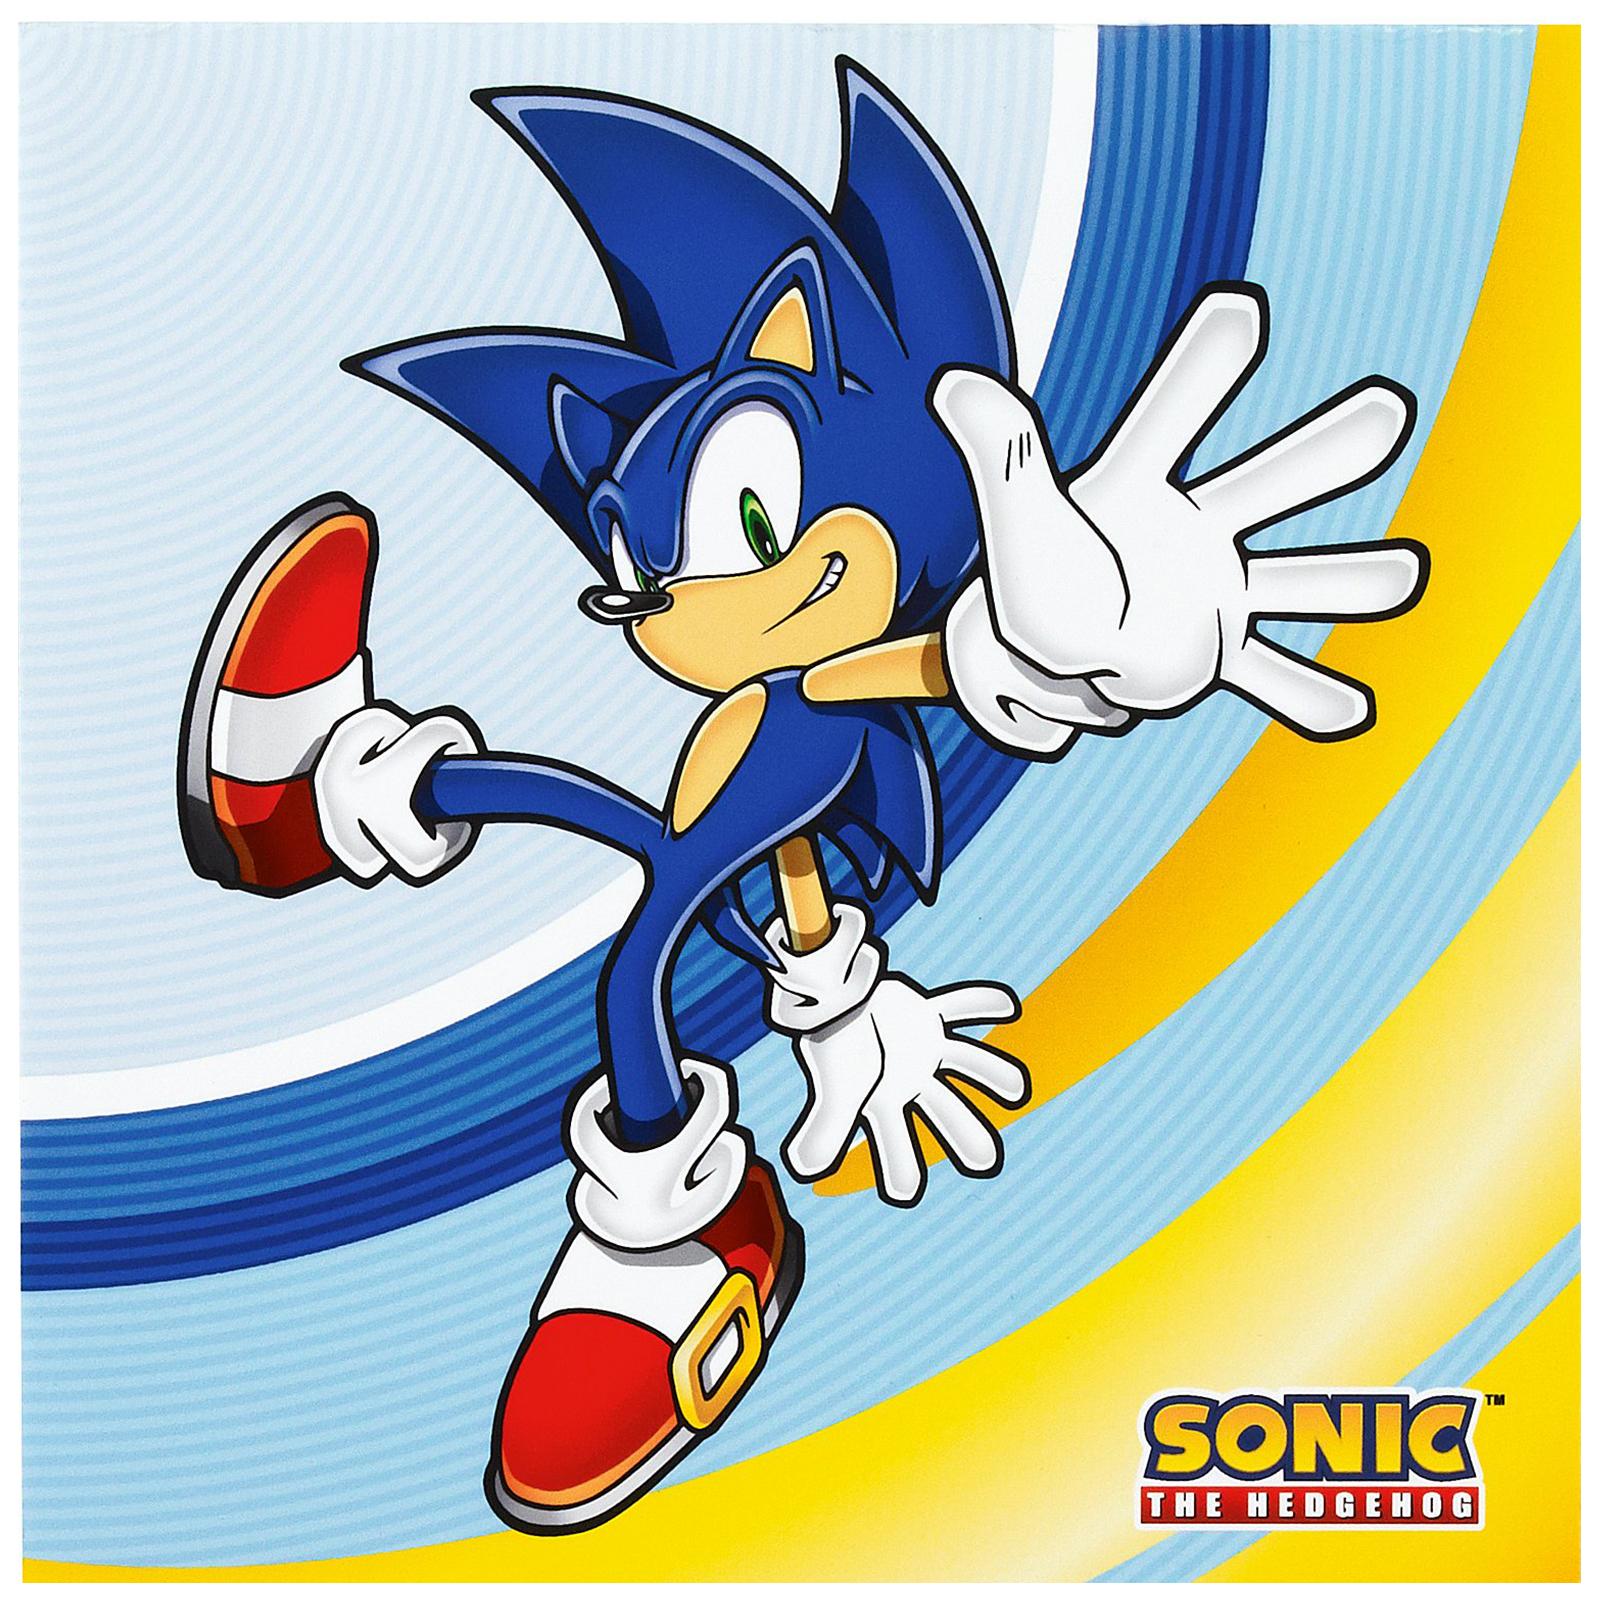 DeviantArt: More Like Sonic the Hedgehog by Jogita6